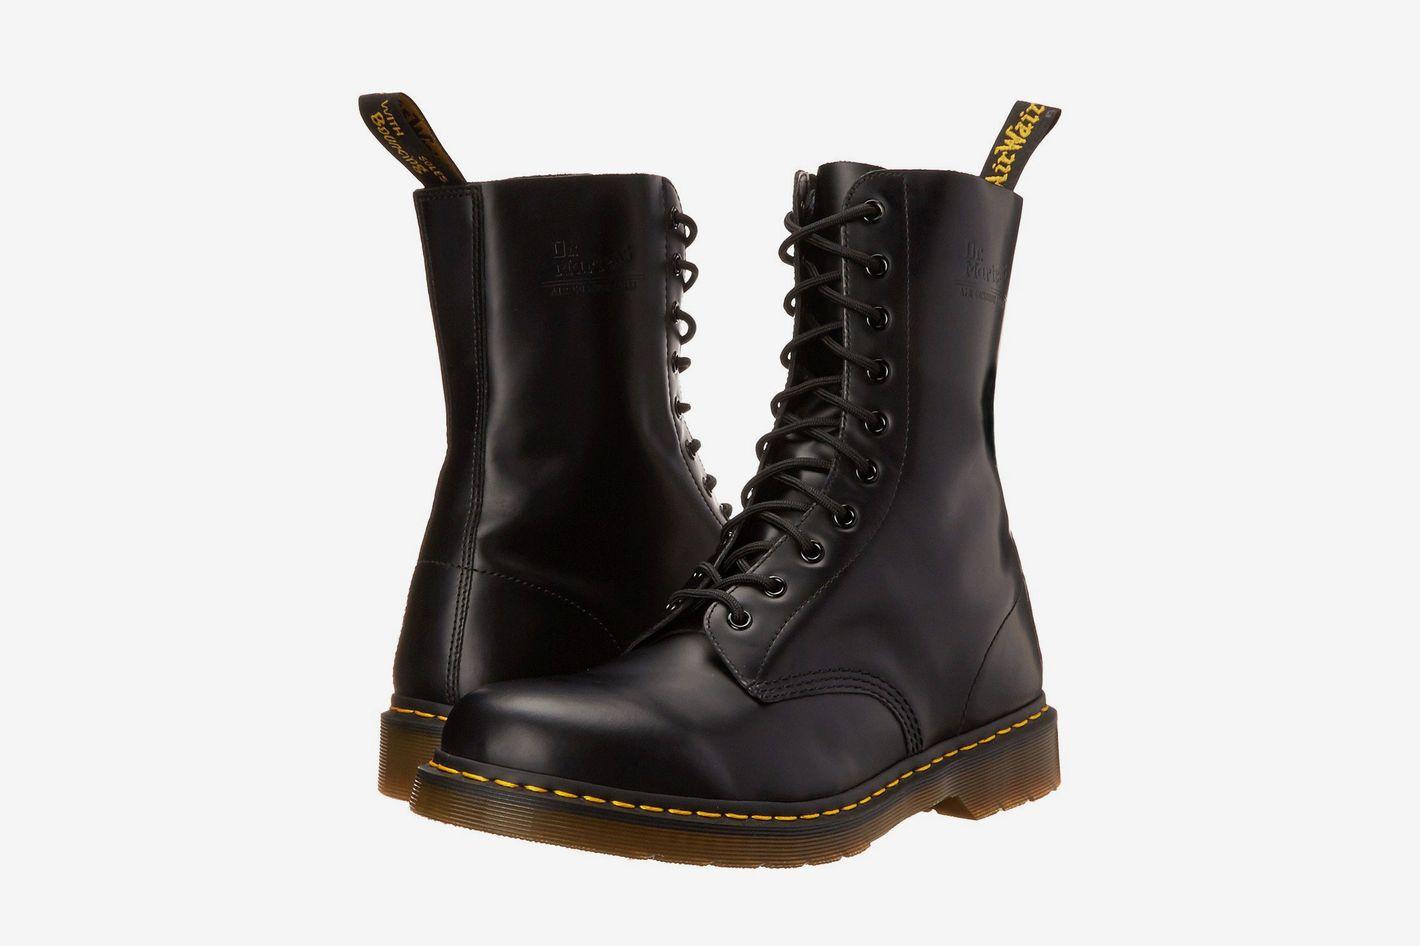 33be8b7f954 11 Best Men's Combat Boots for Stylish Men 2018